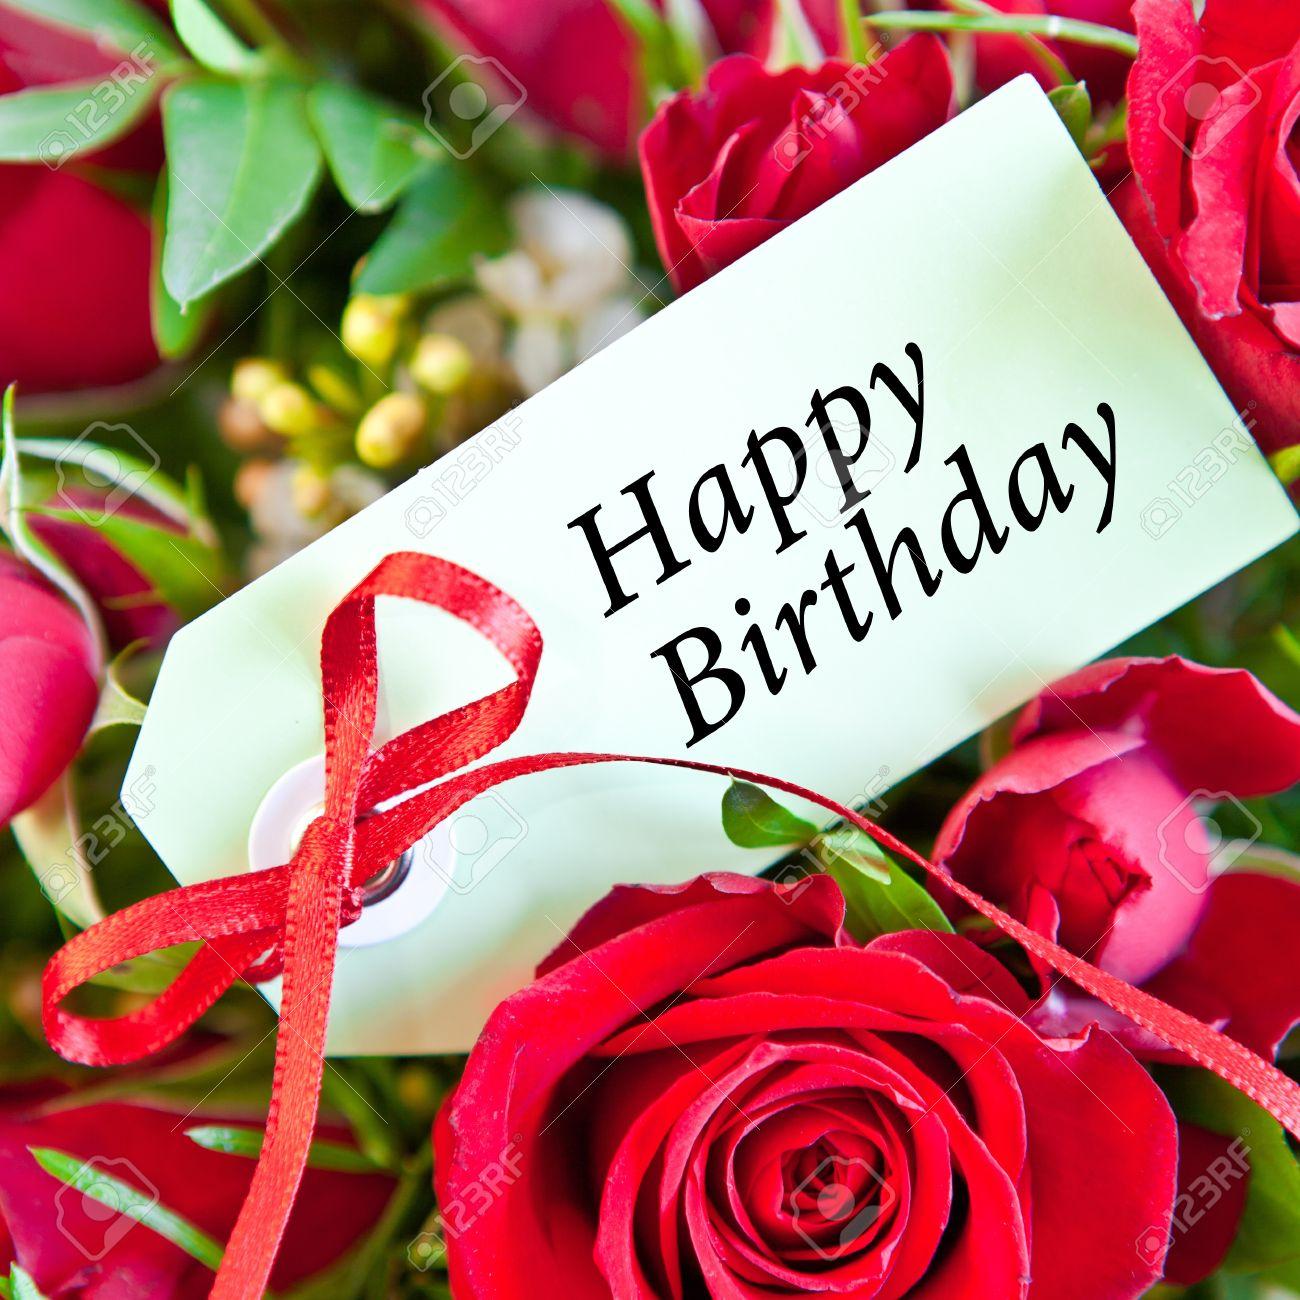 Happy Birthday Roses Pictures